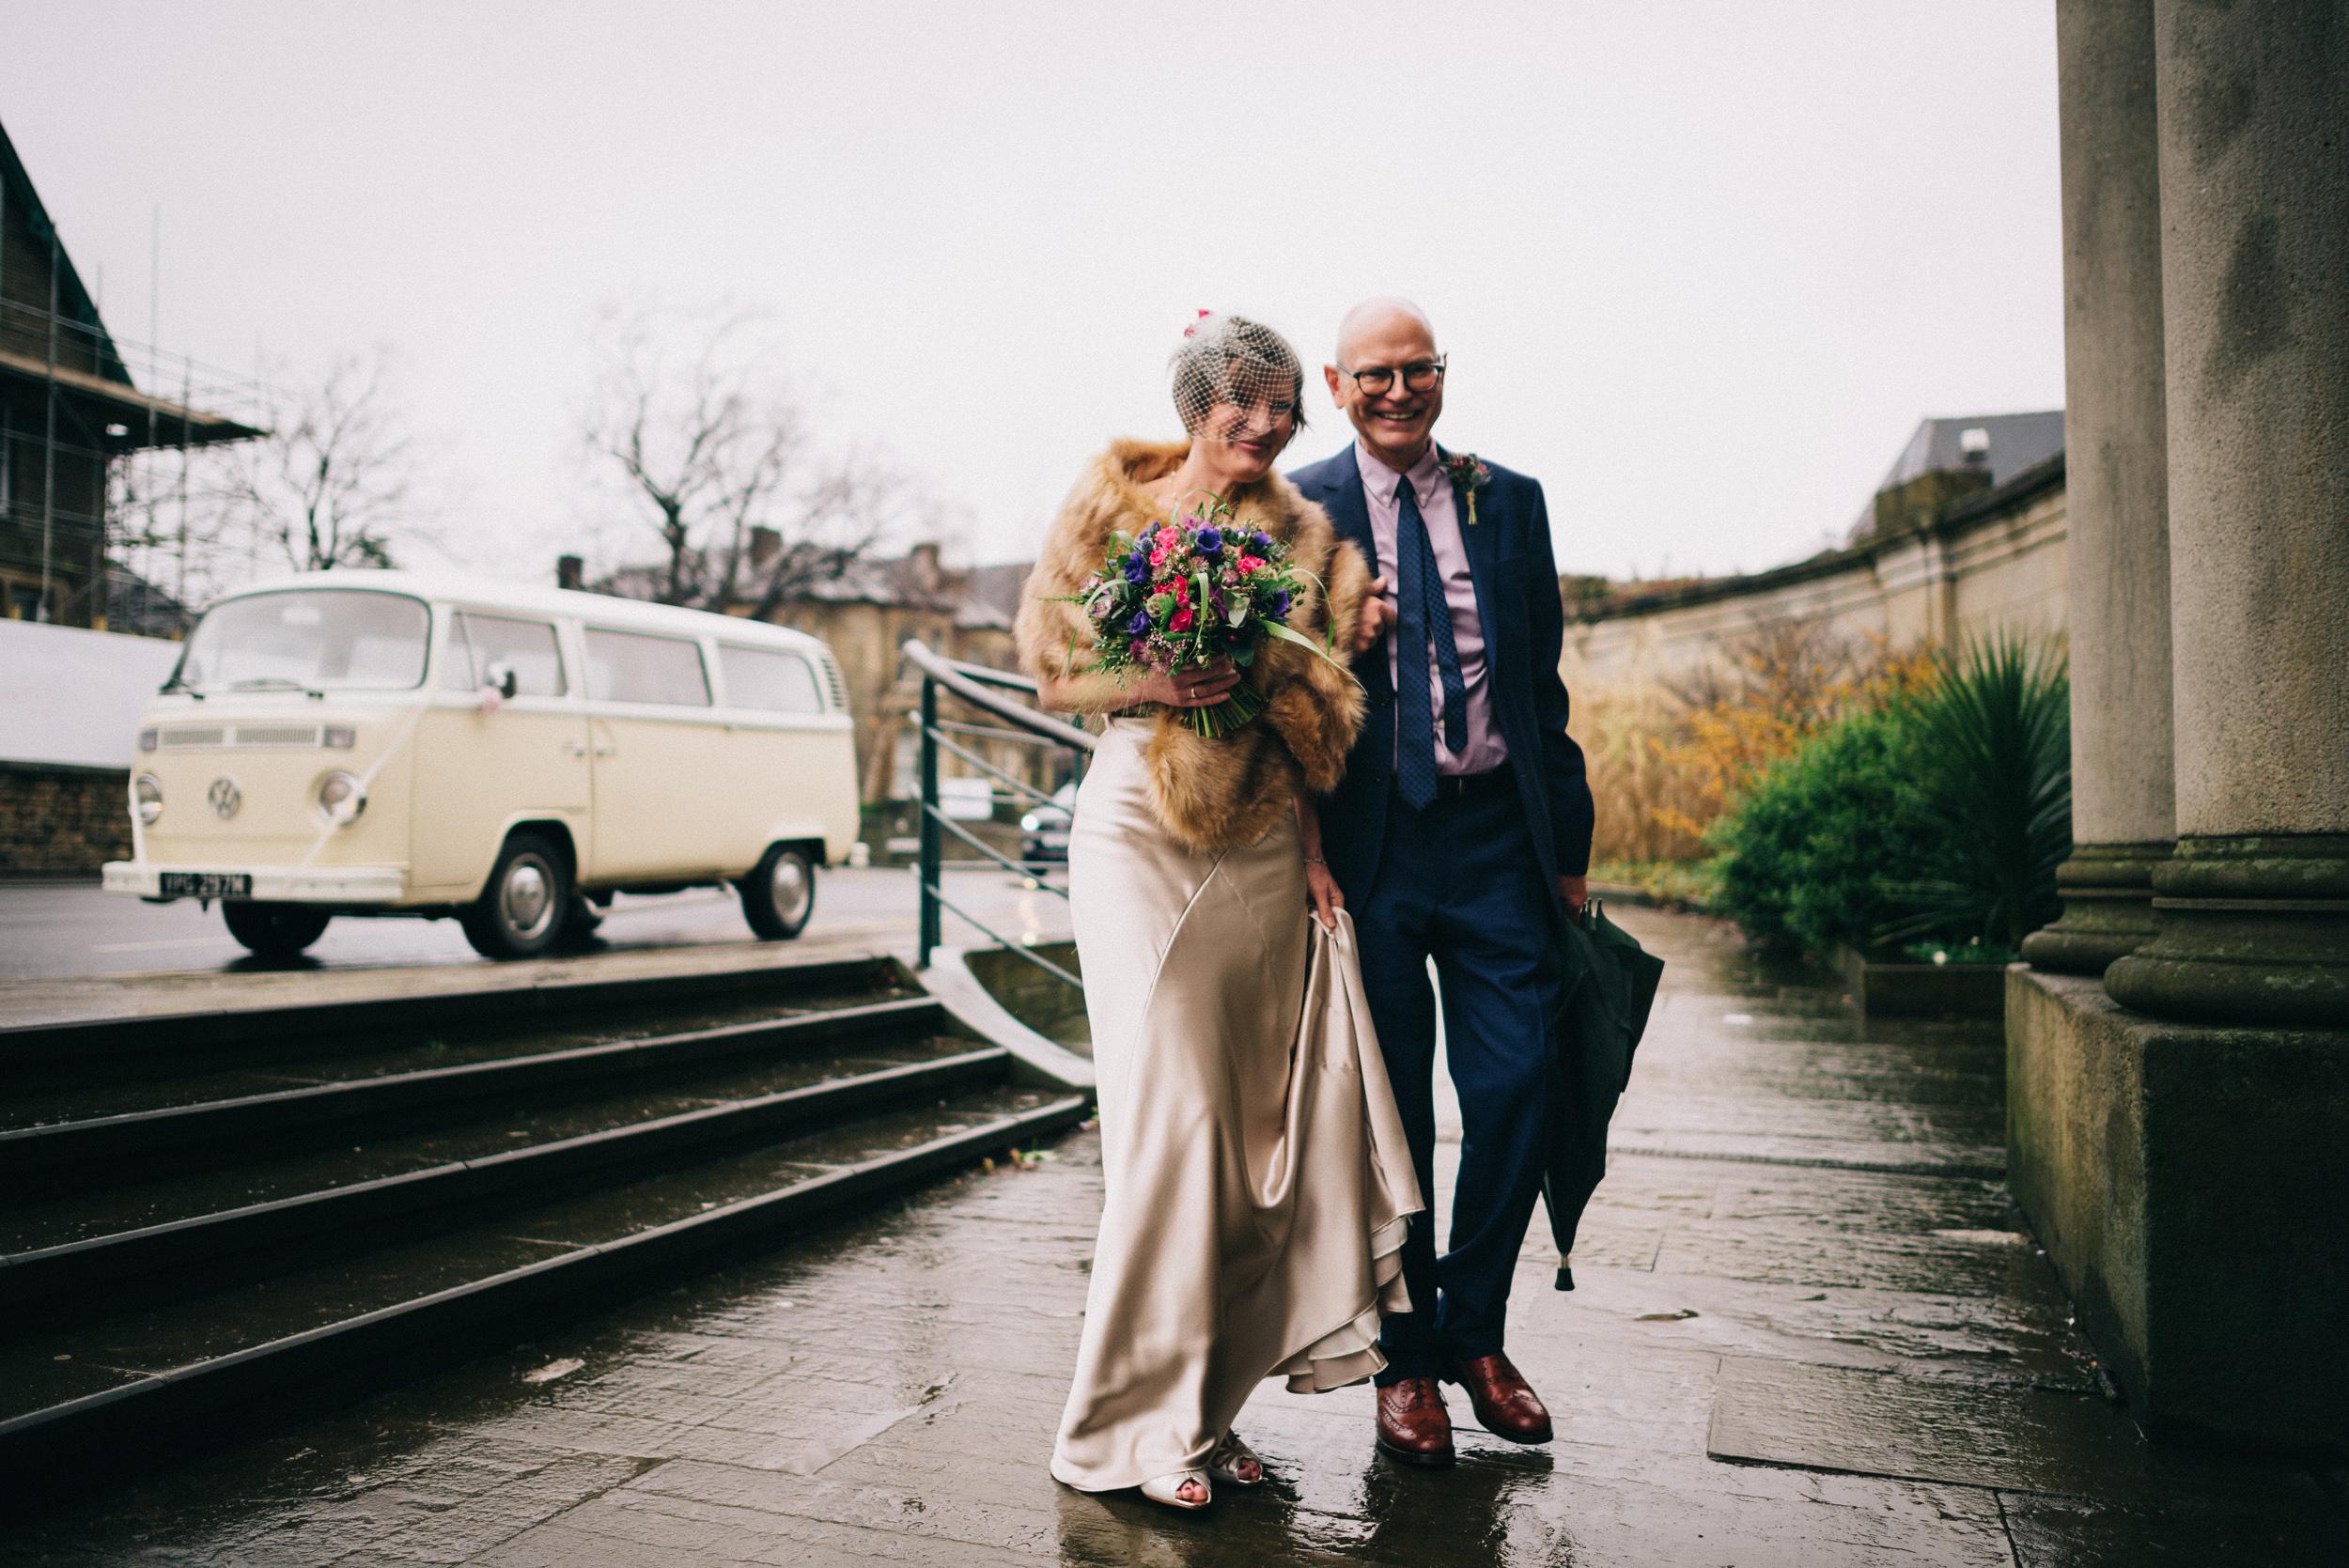 Alice-Bias-Cut-Silk-Wedding-Dress-Kate-Beaumont-Sheffield-Botanical-Gardens-by-Peakography-5.jpg